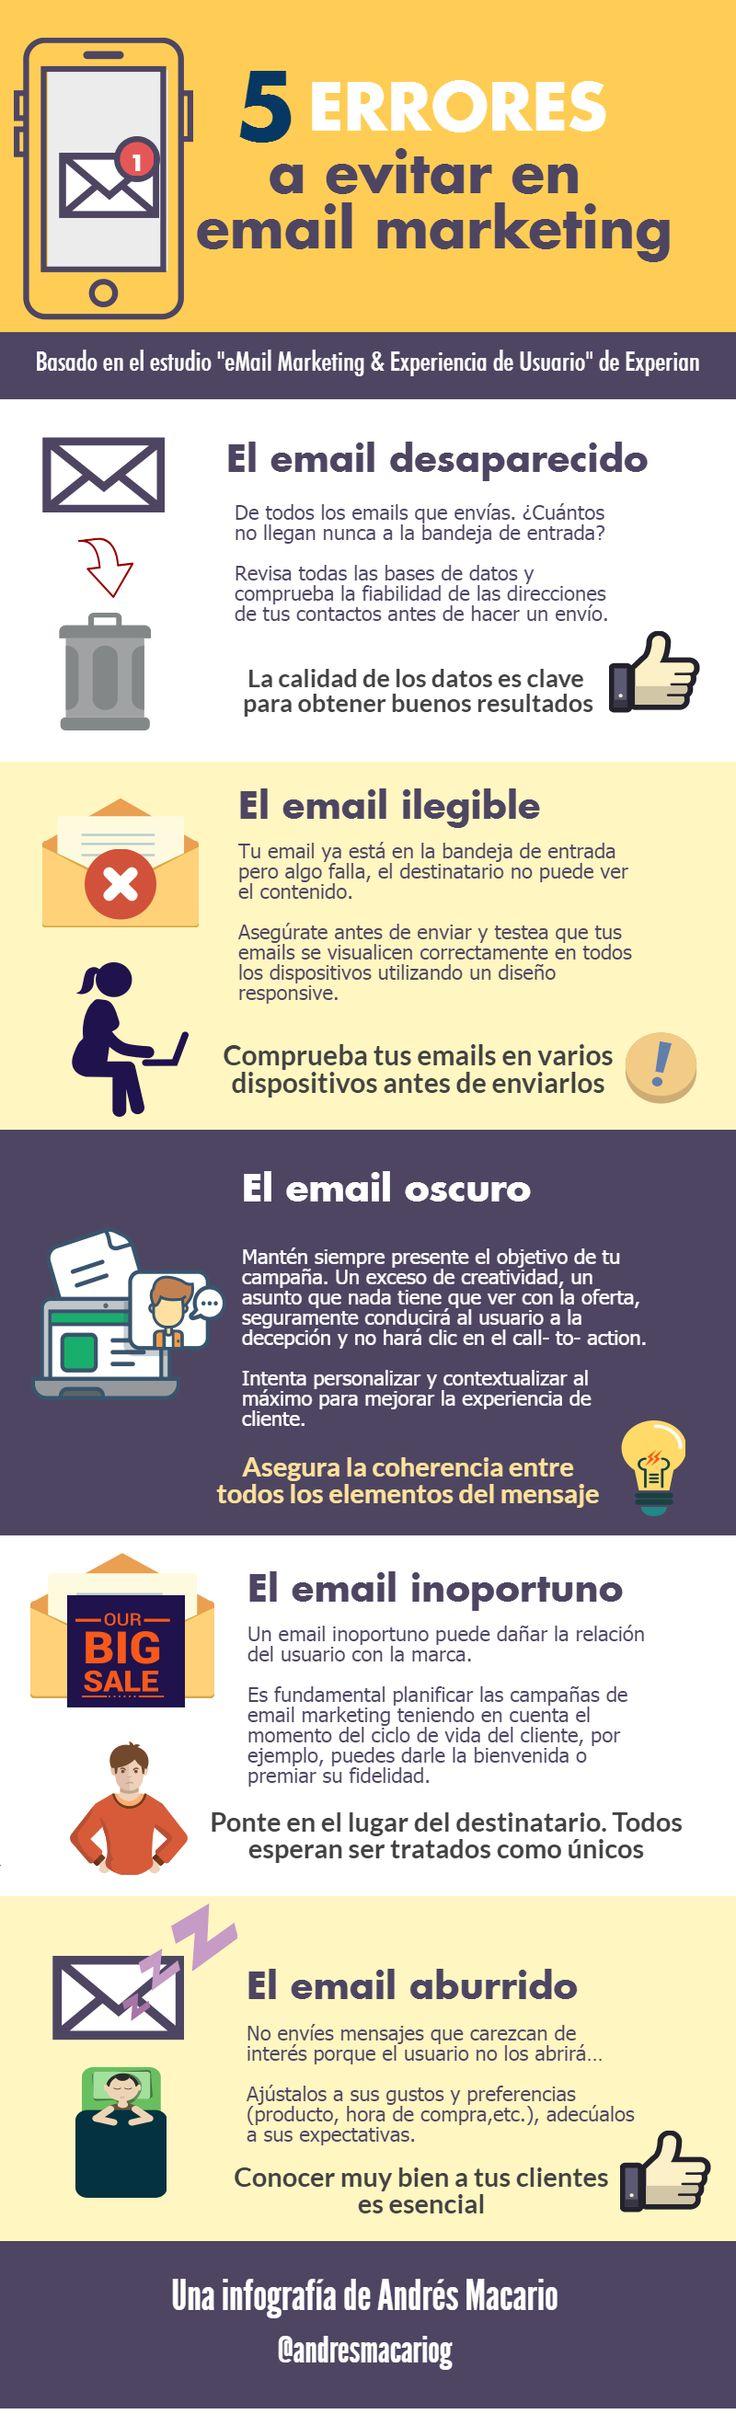 5 errores a evitar en email marketing #infografia